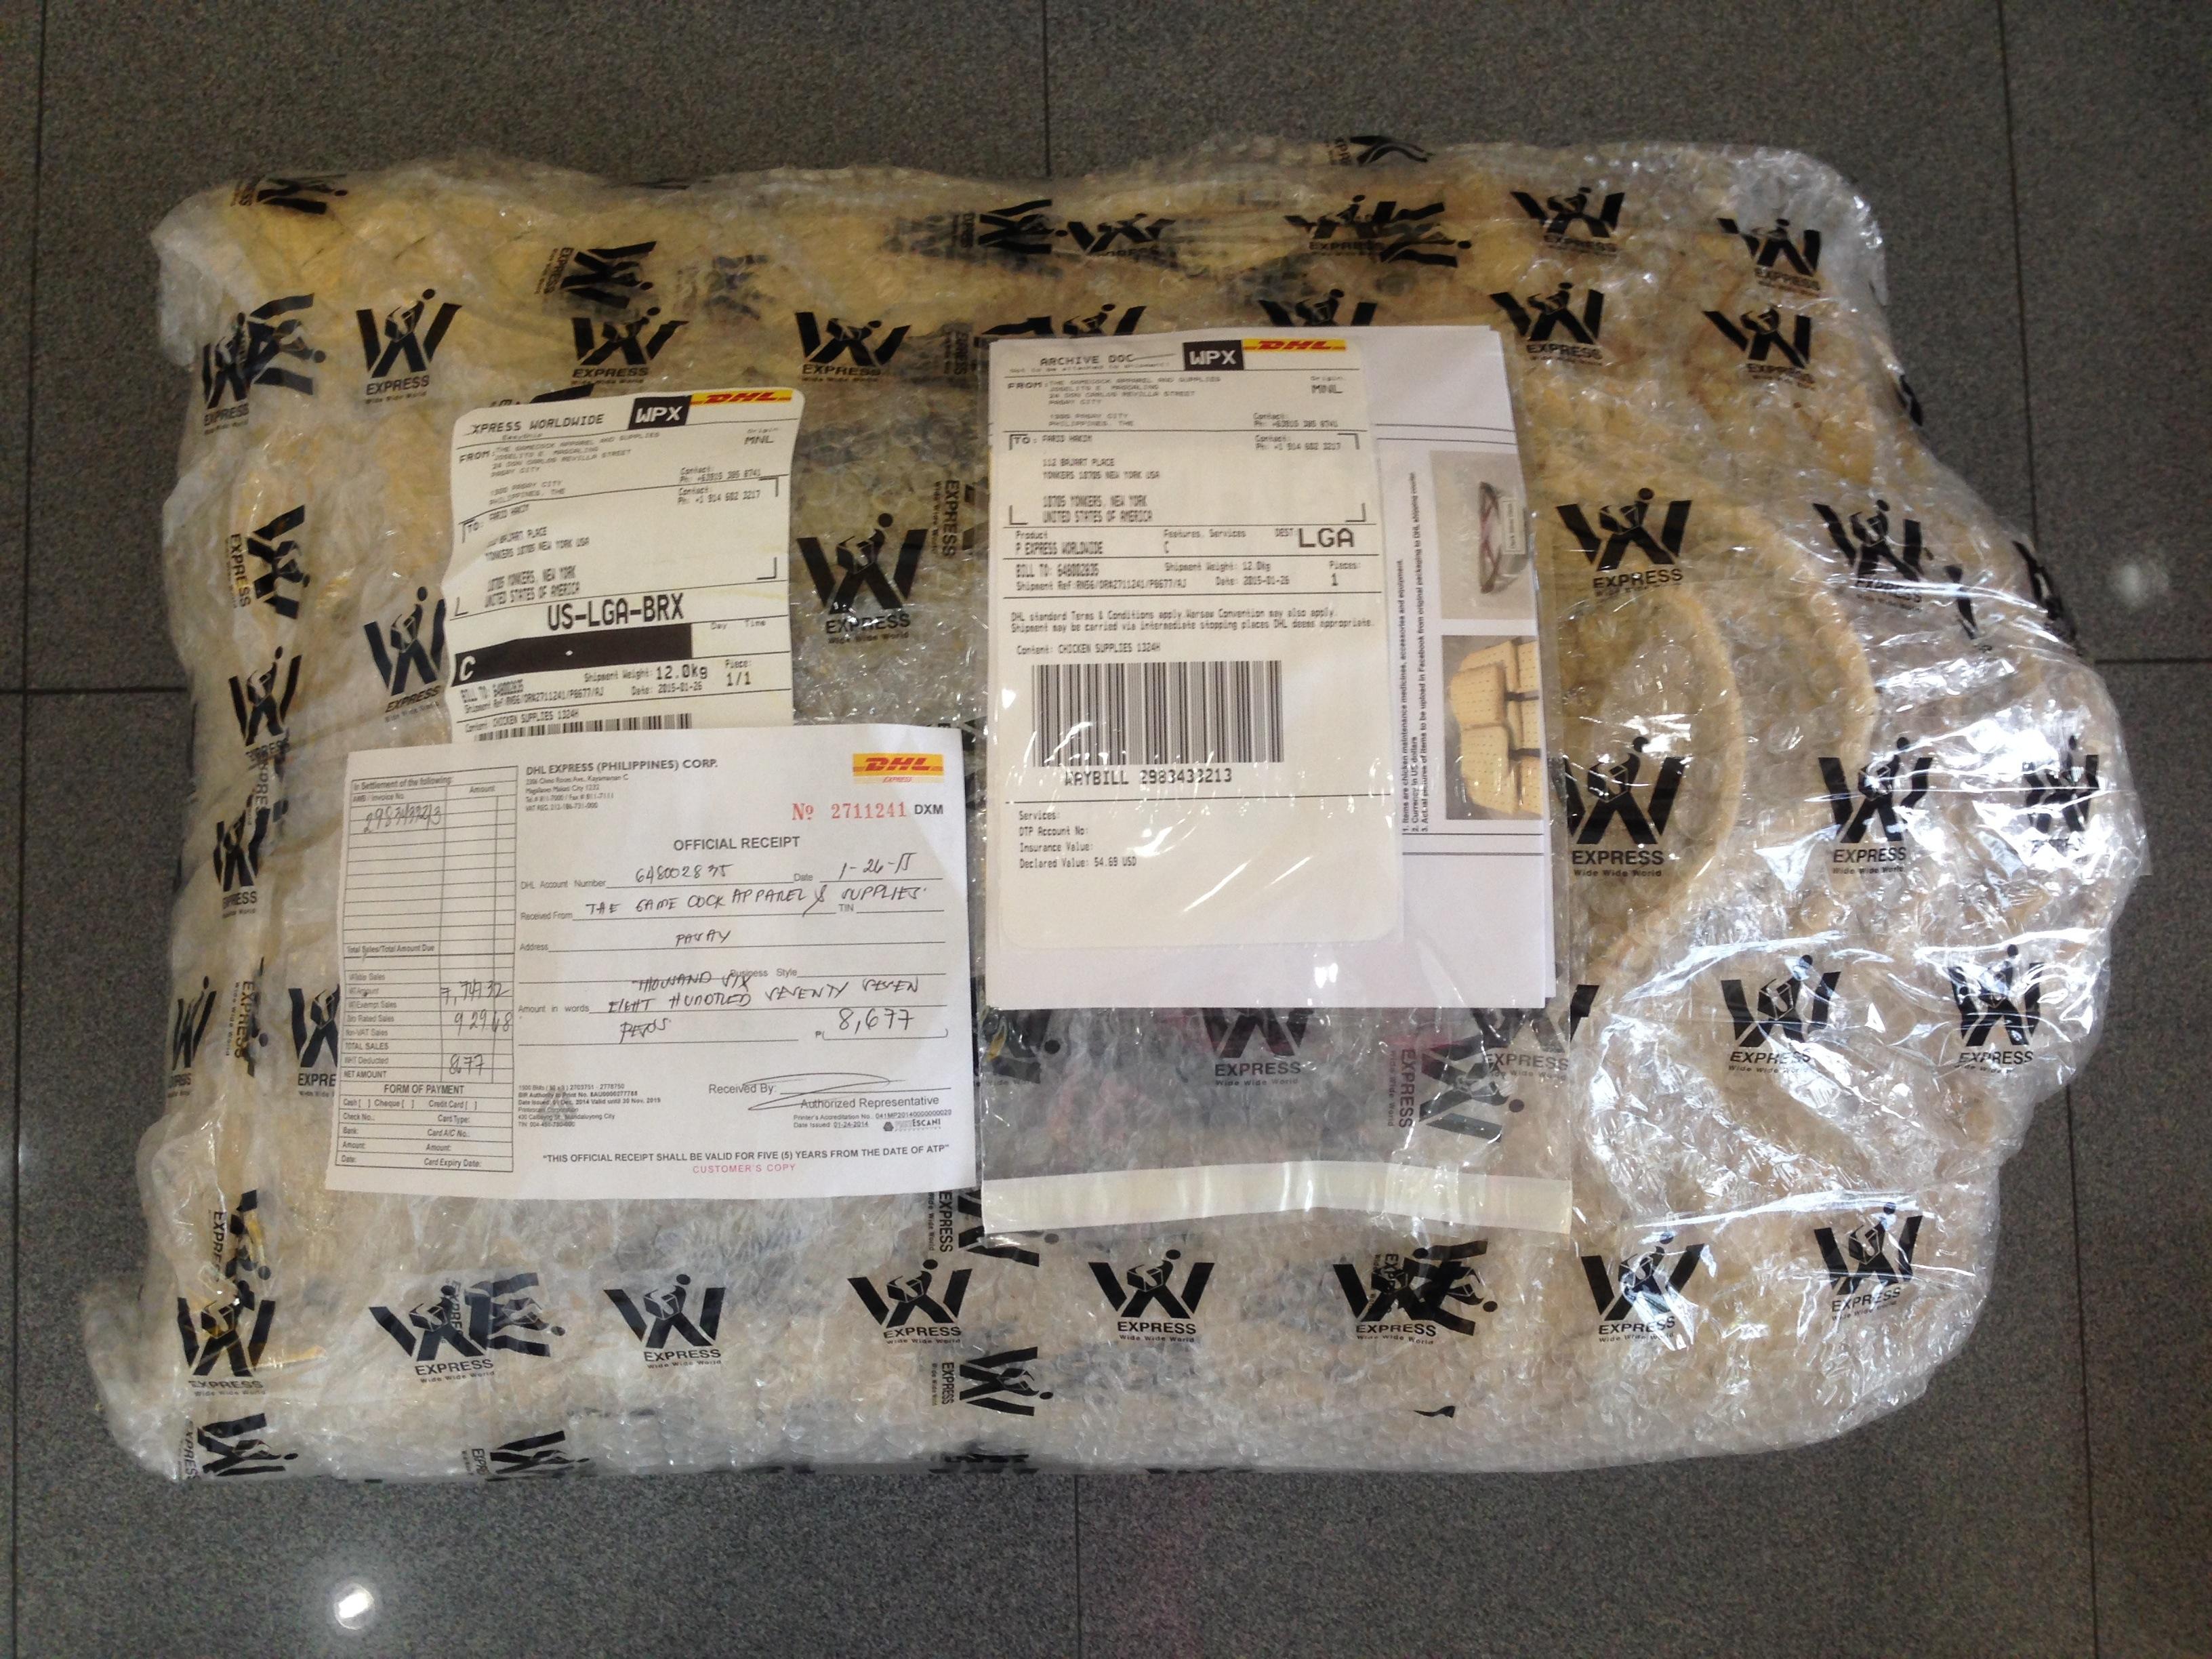 woven bag dhl shipping receipt